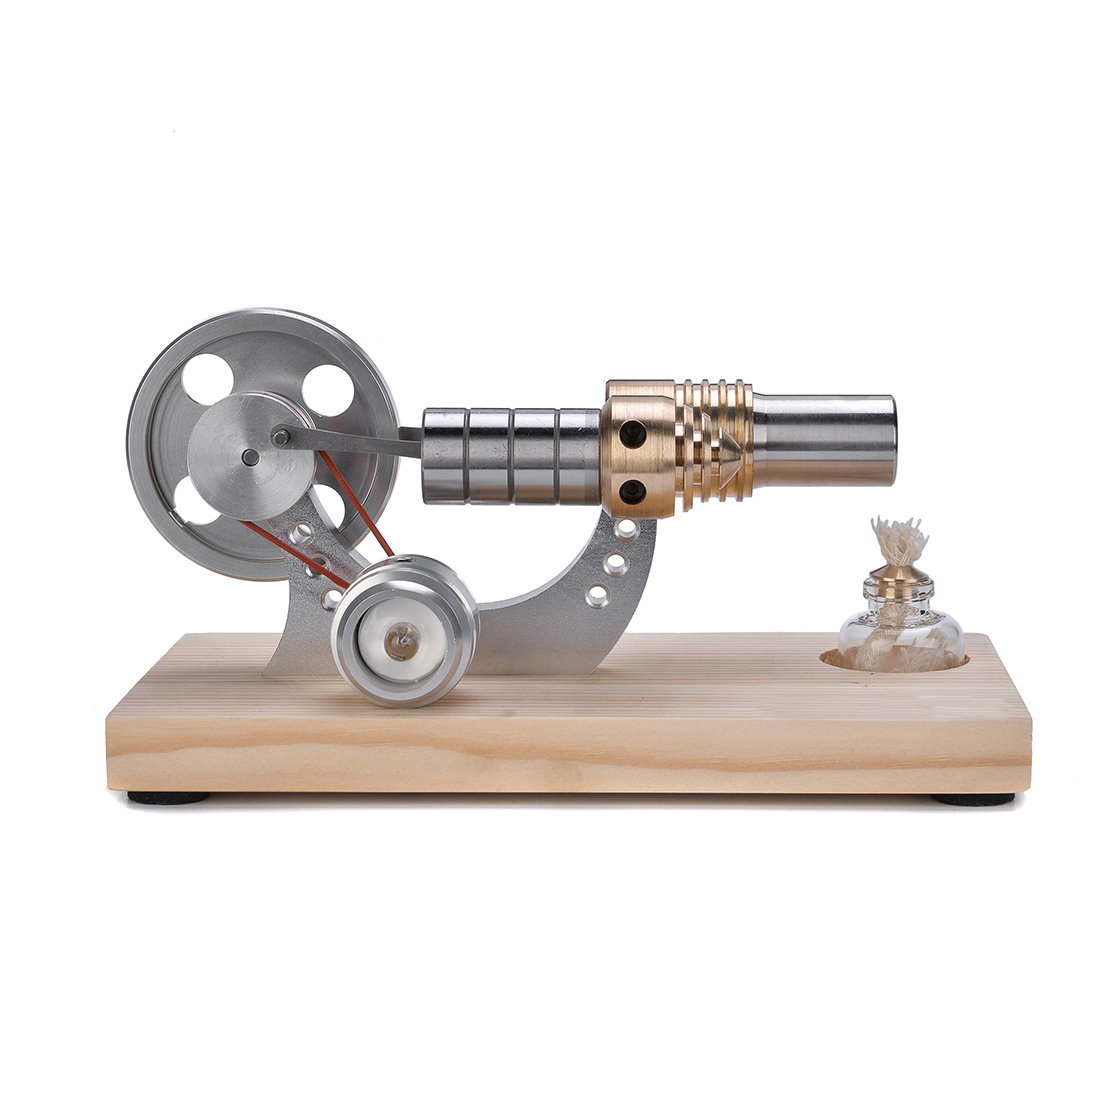 Metal Cylinder Bootable Stirling Engine Model Micro External Combustion Engine Model metal baseboard double cylinder micro diy stirling engine external combustion engine